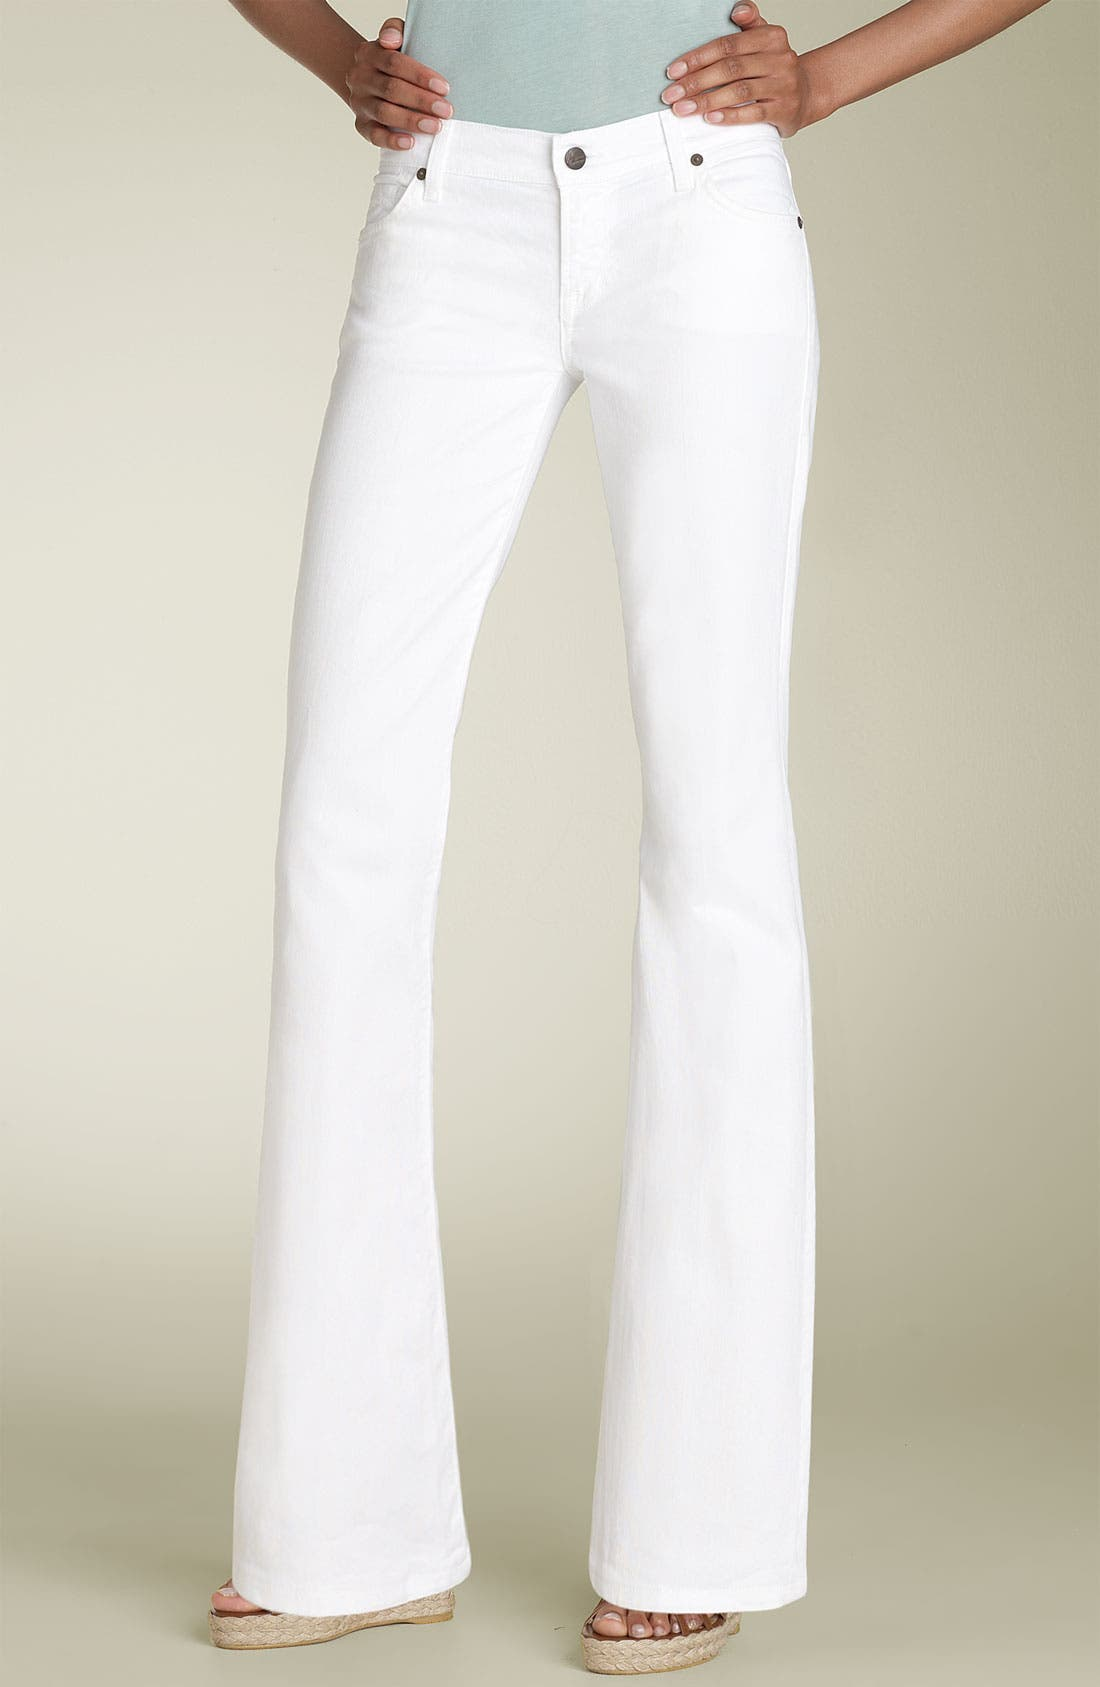 Main Image - Citizens of Humanity 'Dita' Bootcut Stretch Jeans (Santorini White) (Petite)